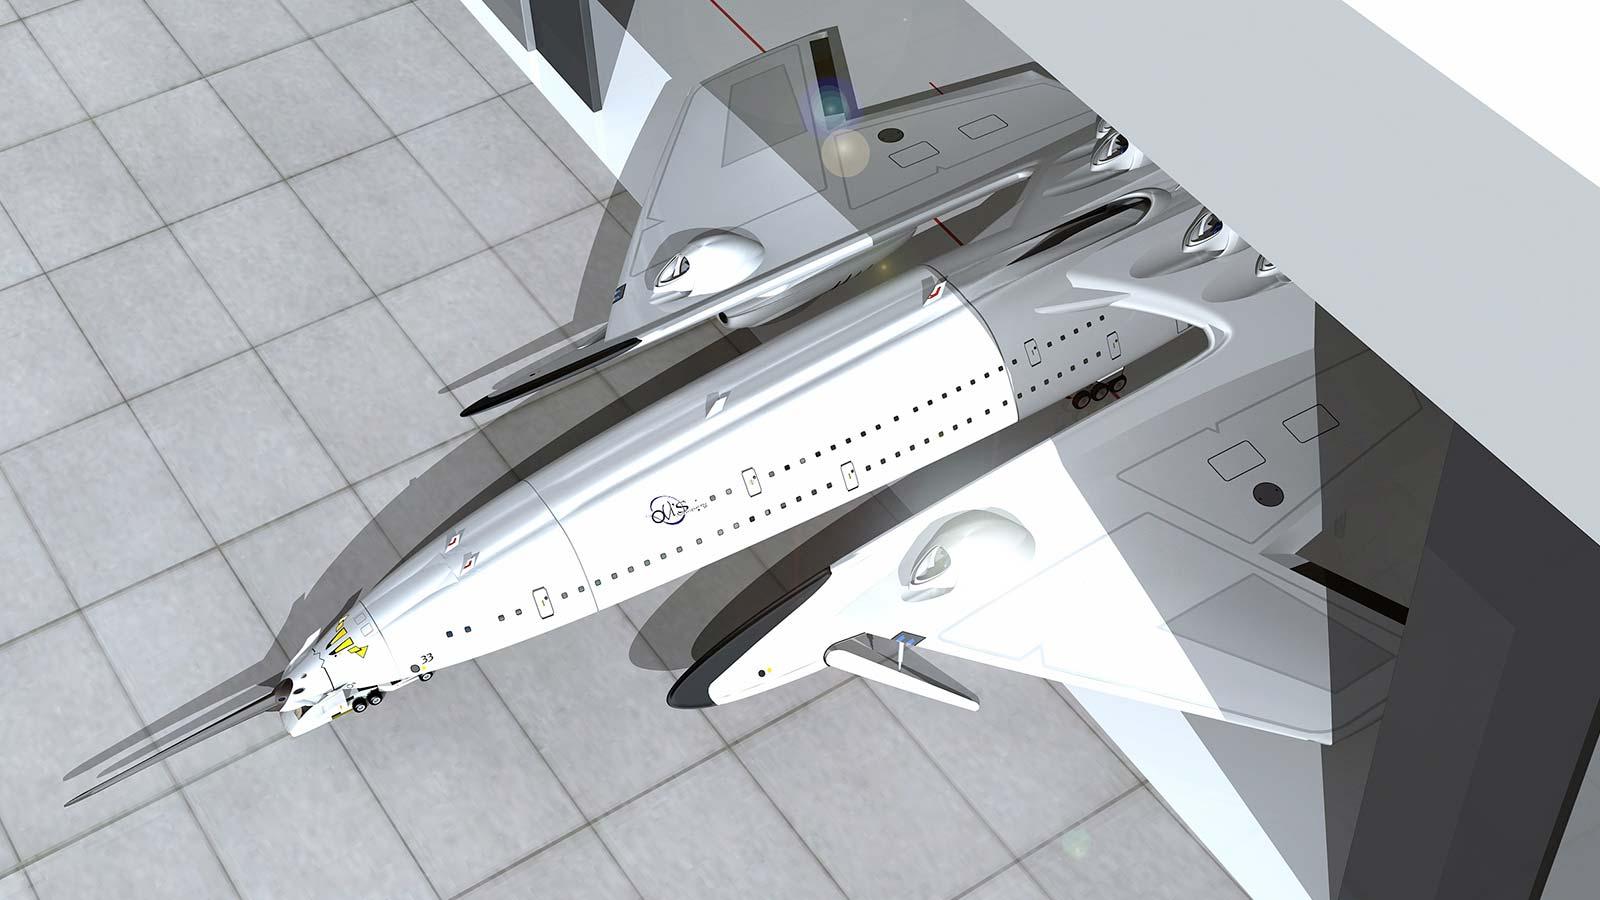 Oscar Viñals on future of flight: Moon tourism, nuclear fusion | CNN